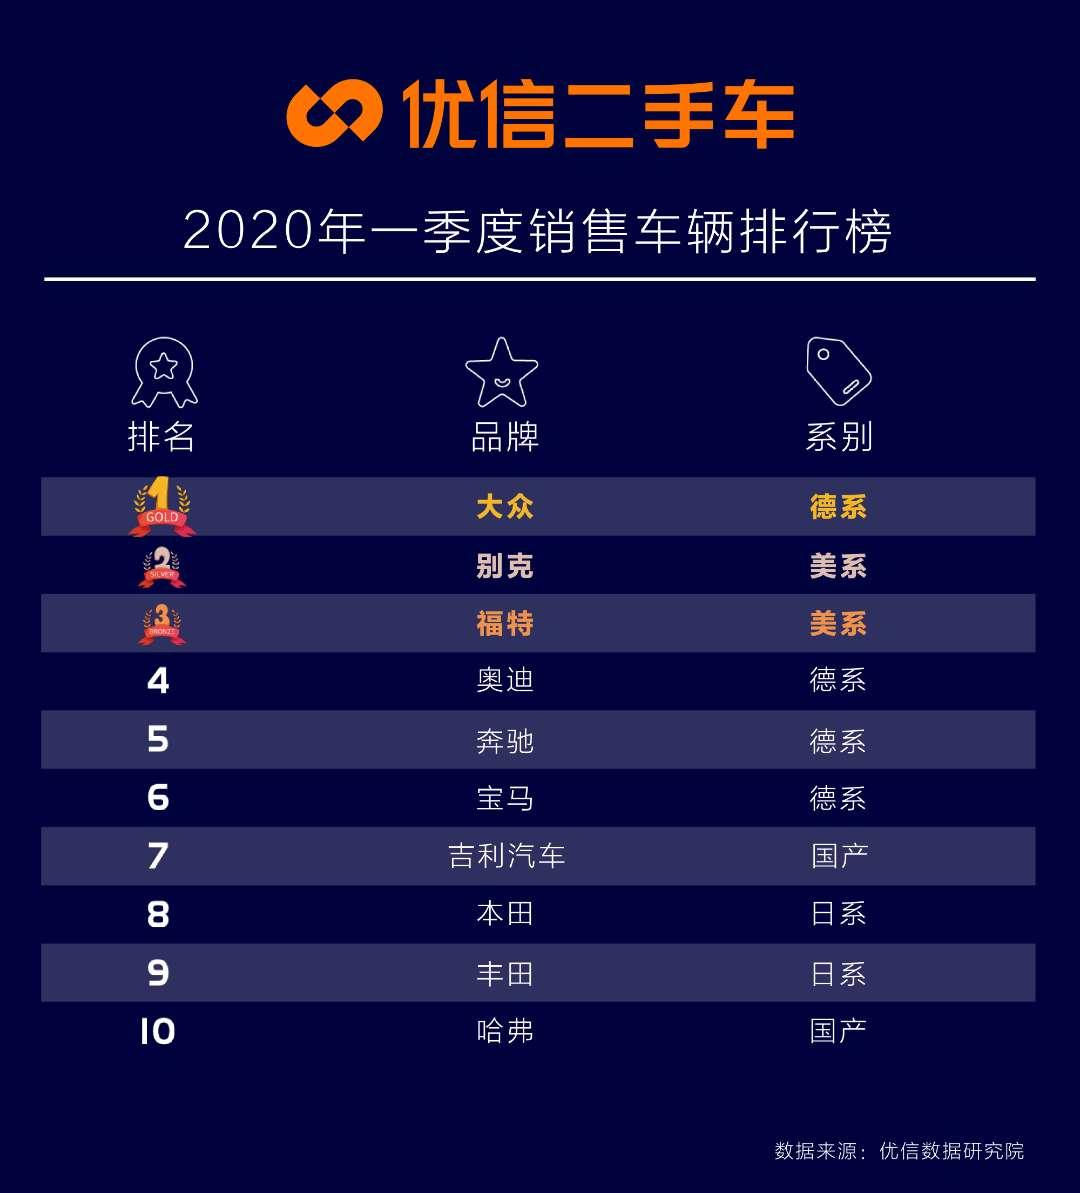 C:\Users\JIANGG~1\AppData\Local\Temp\WeChat Files\f7351dbfadd2ba6fe8e1b1bfcb50e5c.jpg